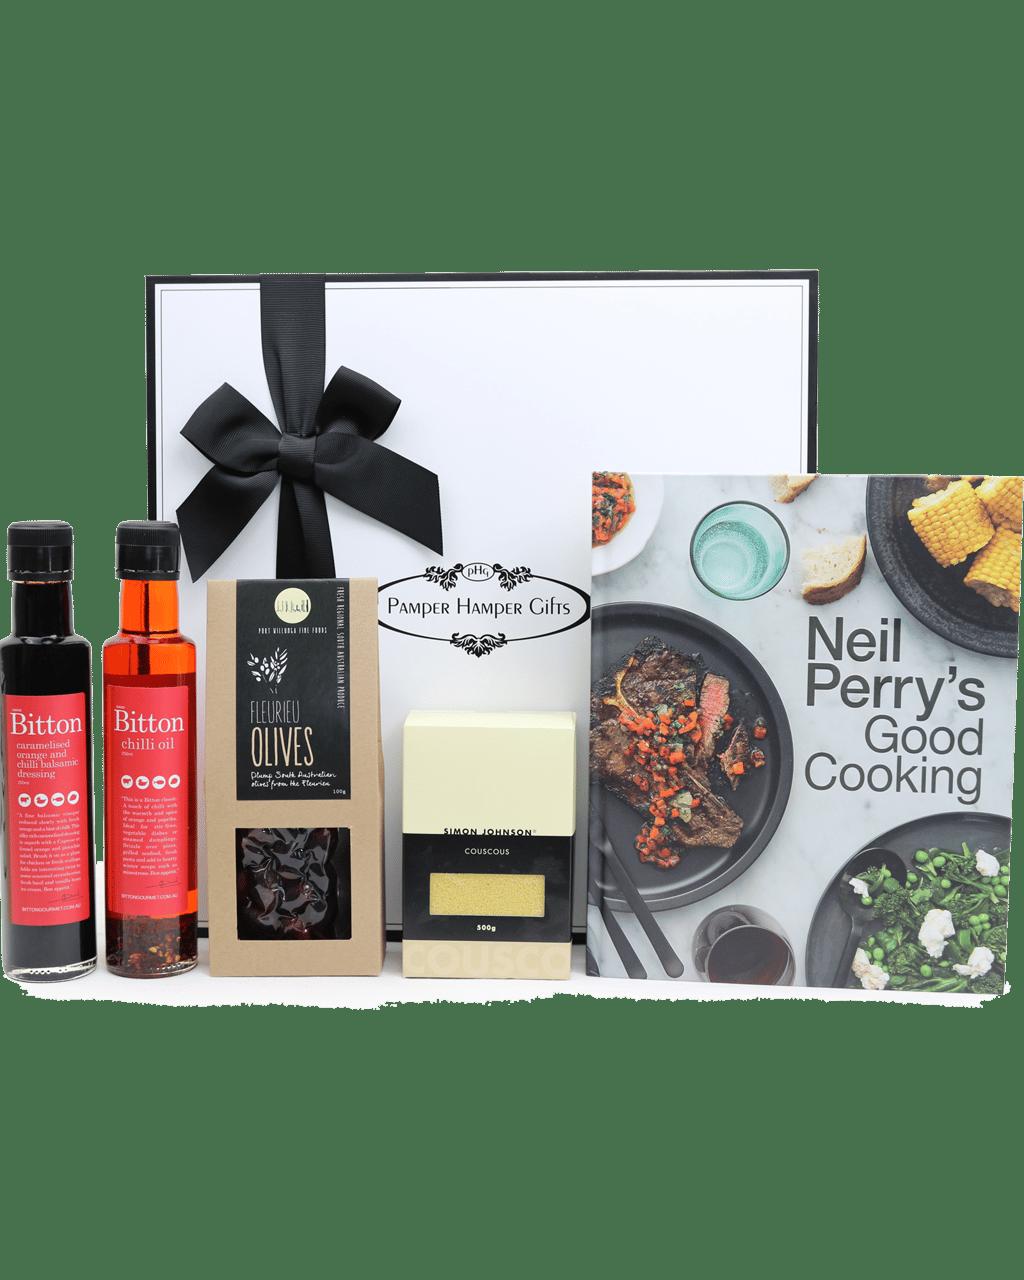 Pamper Hamper Gifts Neil Perry Good Cooking Gourmet Hamper